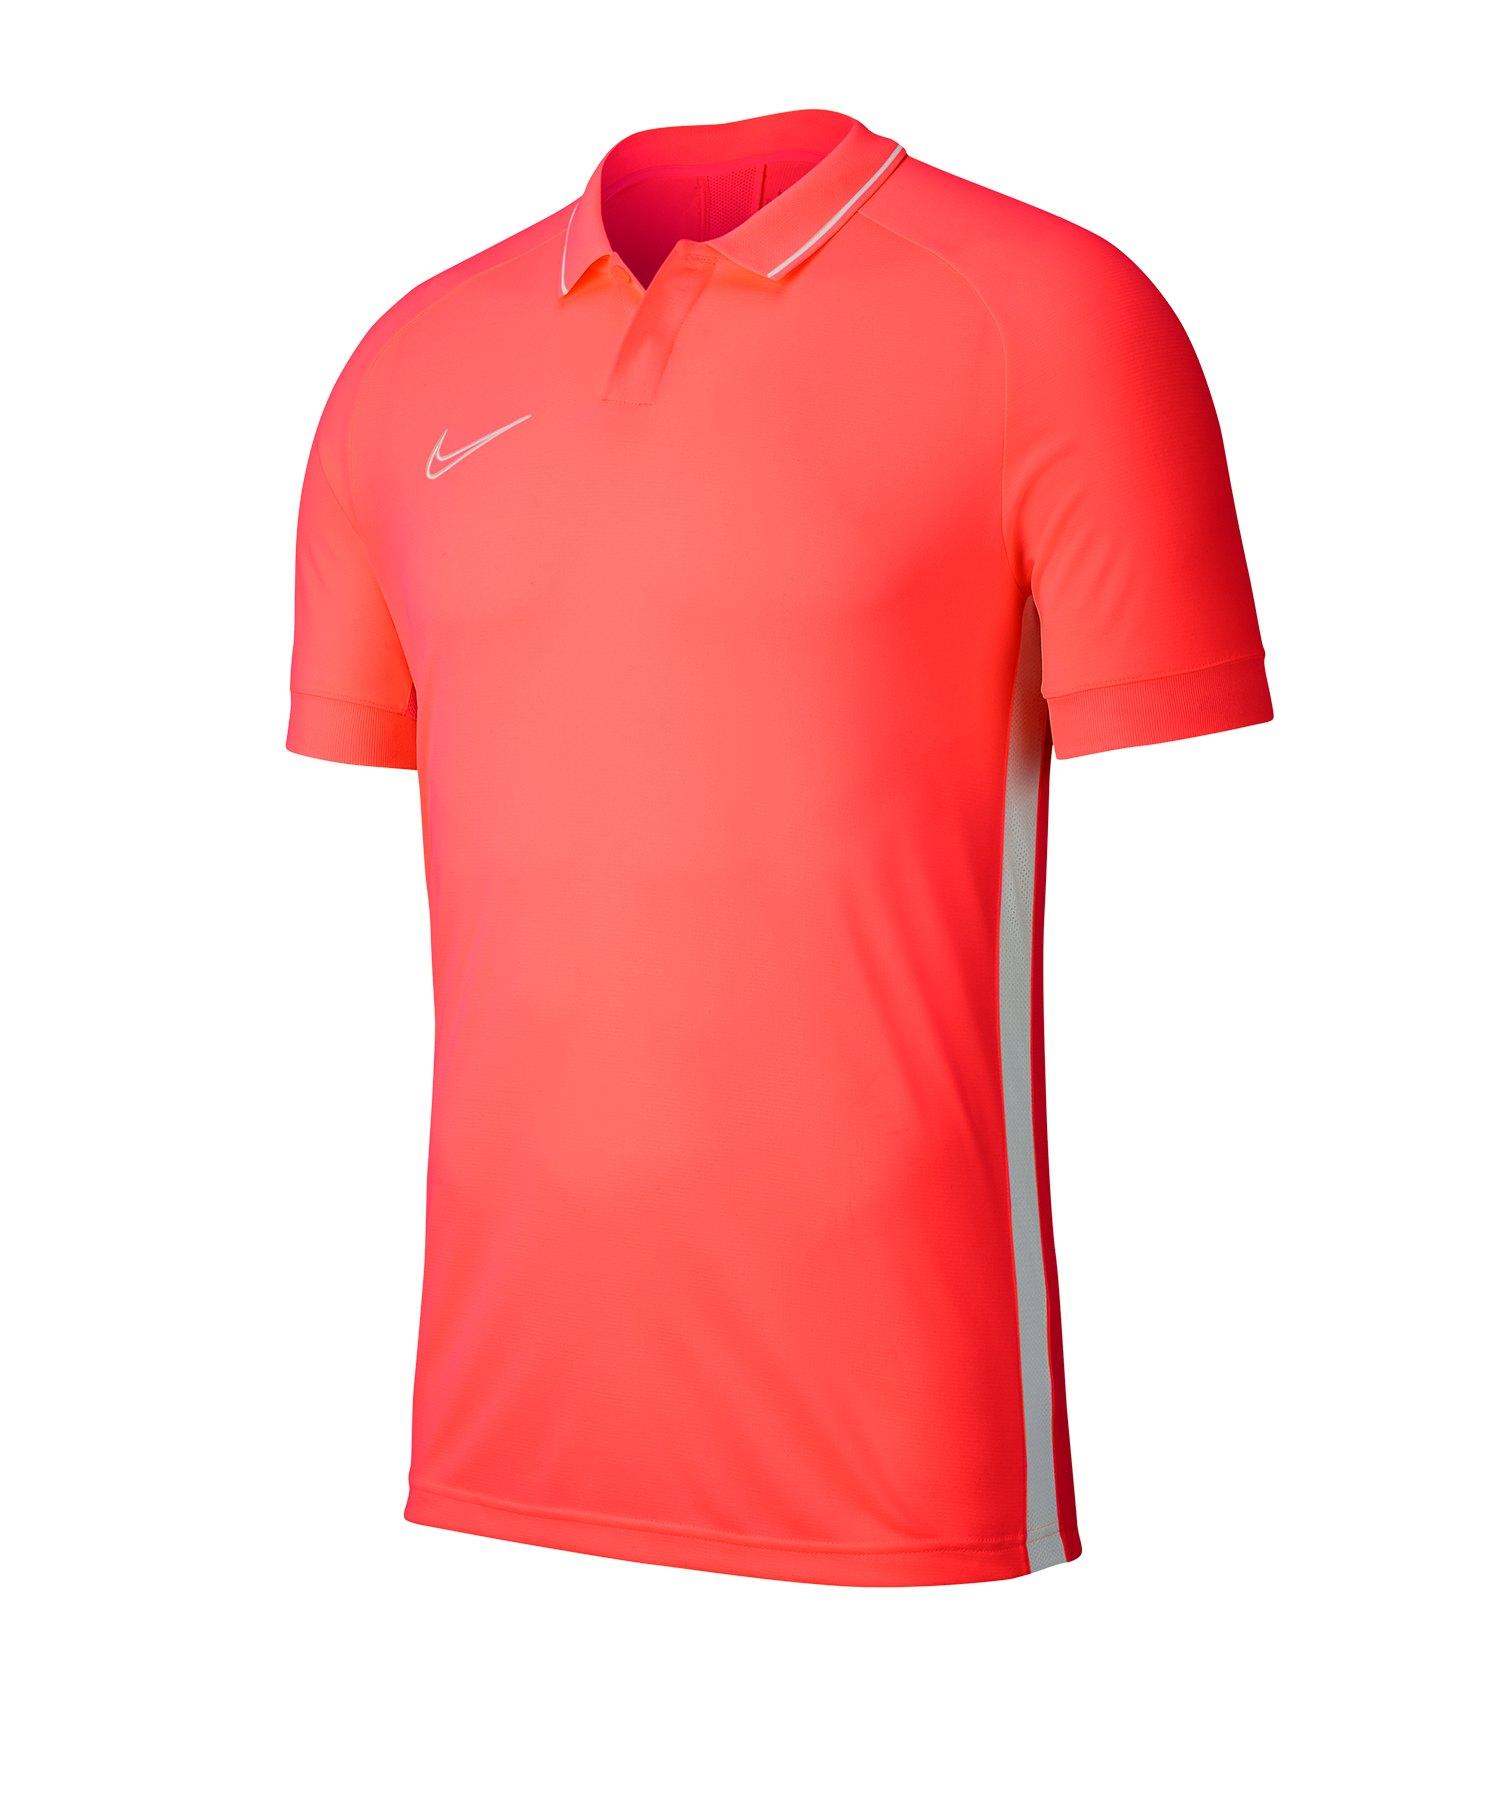 Nike Academy 19 Poloshirt Rot Weiss F671 - rot